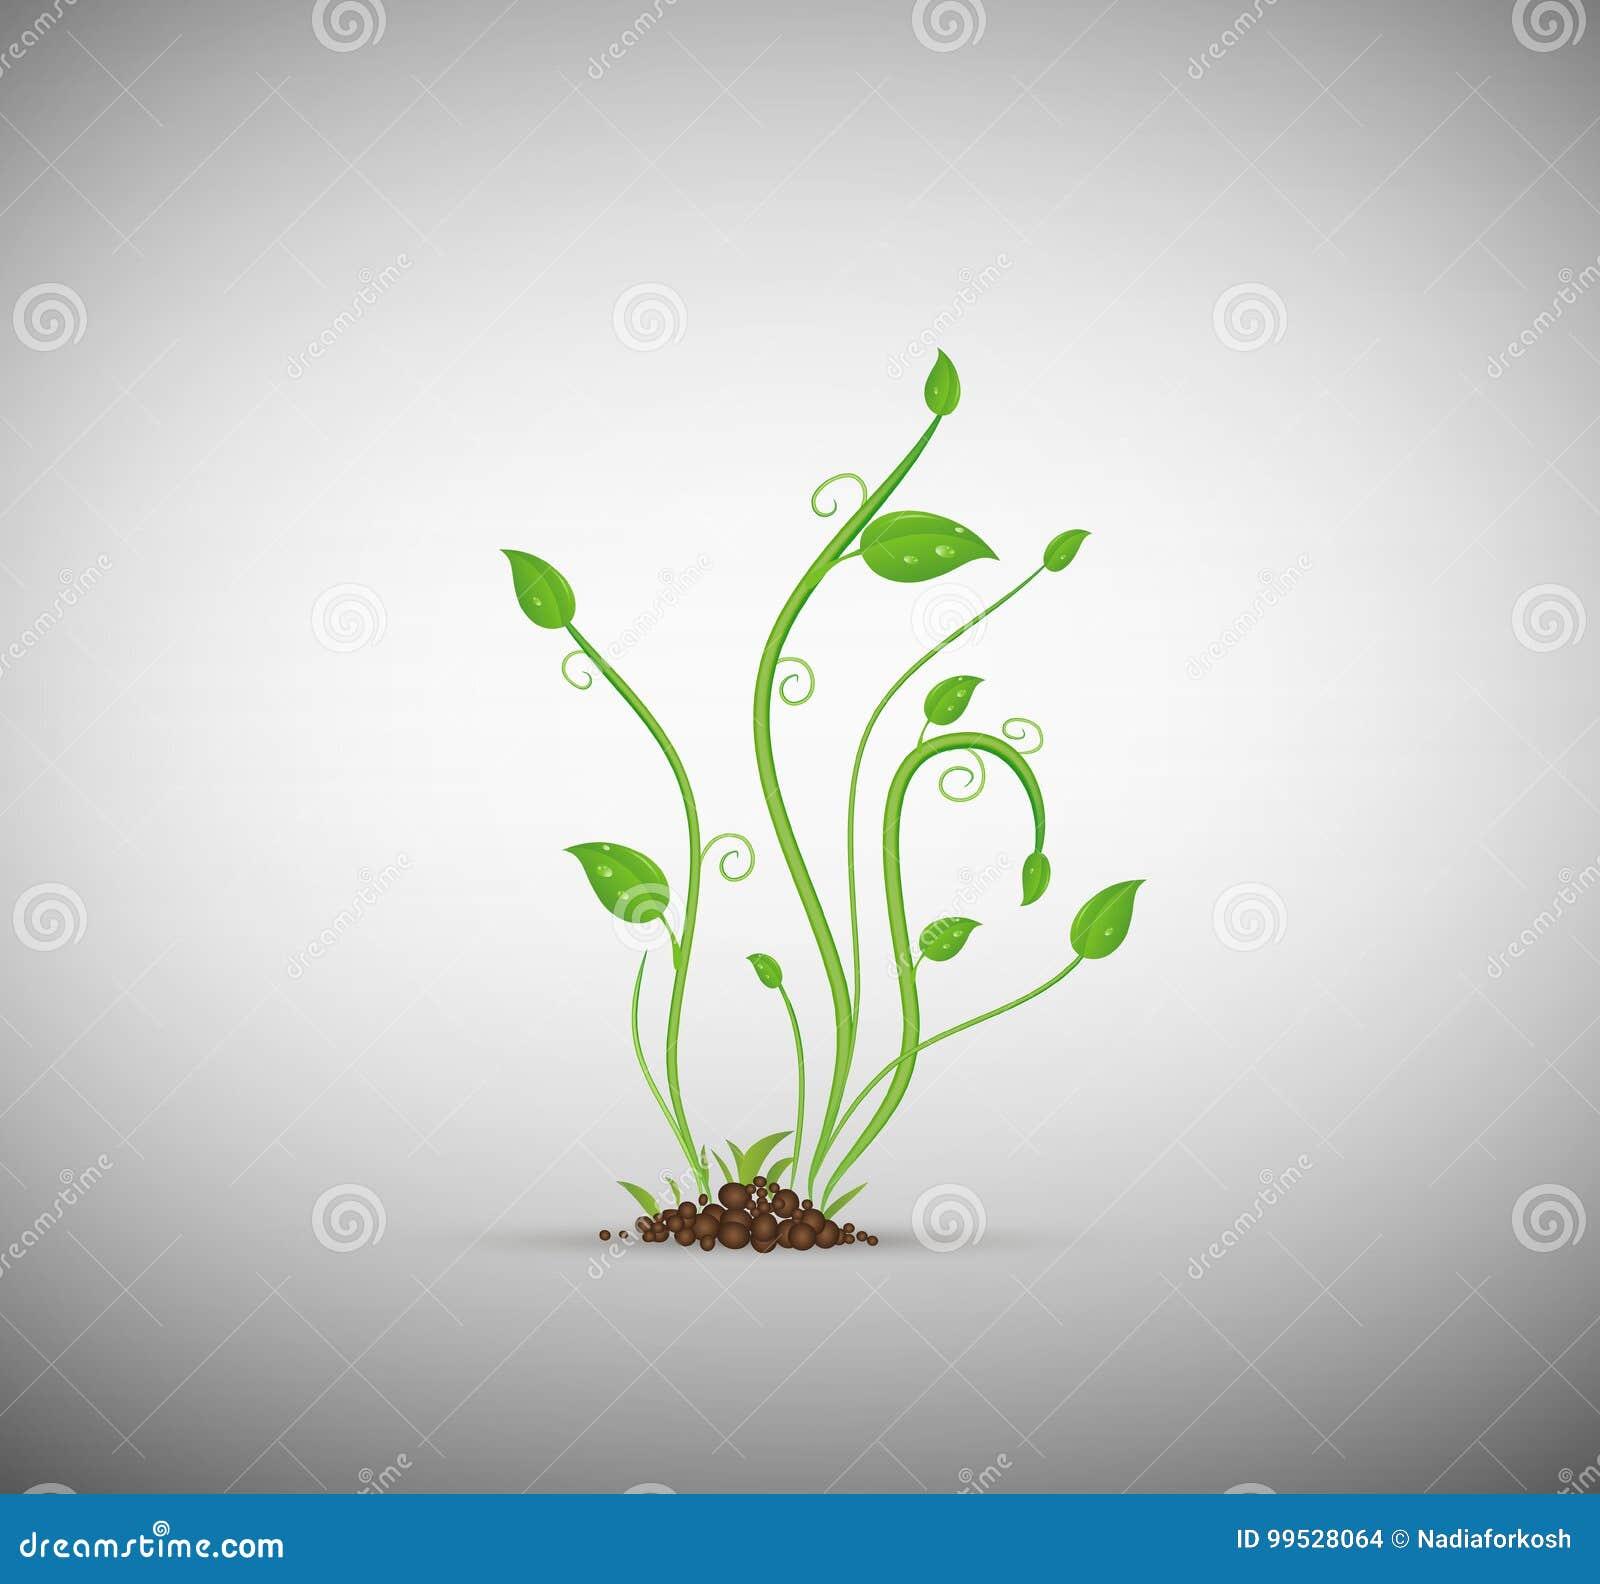 Grüner Sprössling im Boden lokalisiert,